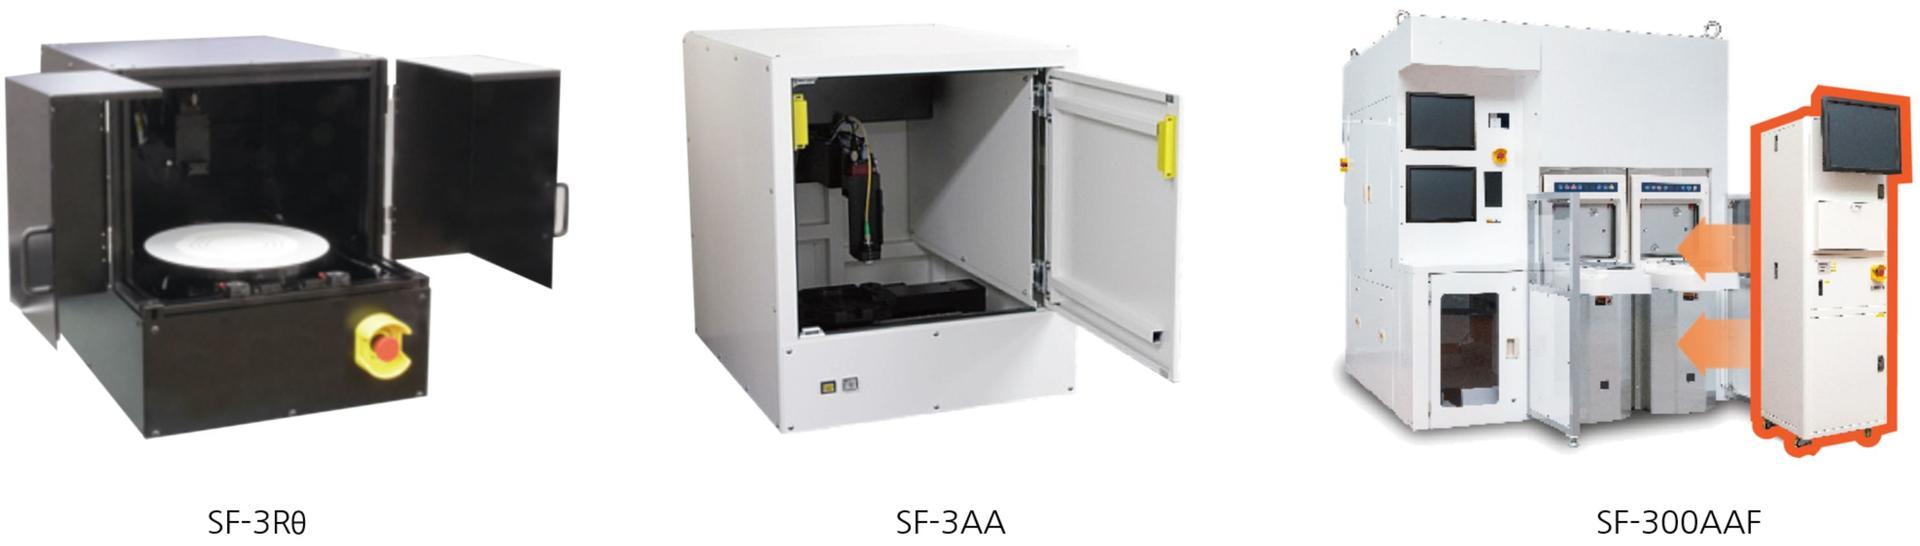 Product image: SF-3Rθ, SF-3AA and SF-300AAF